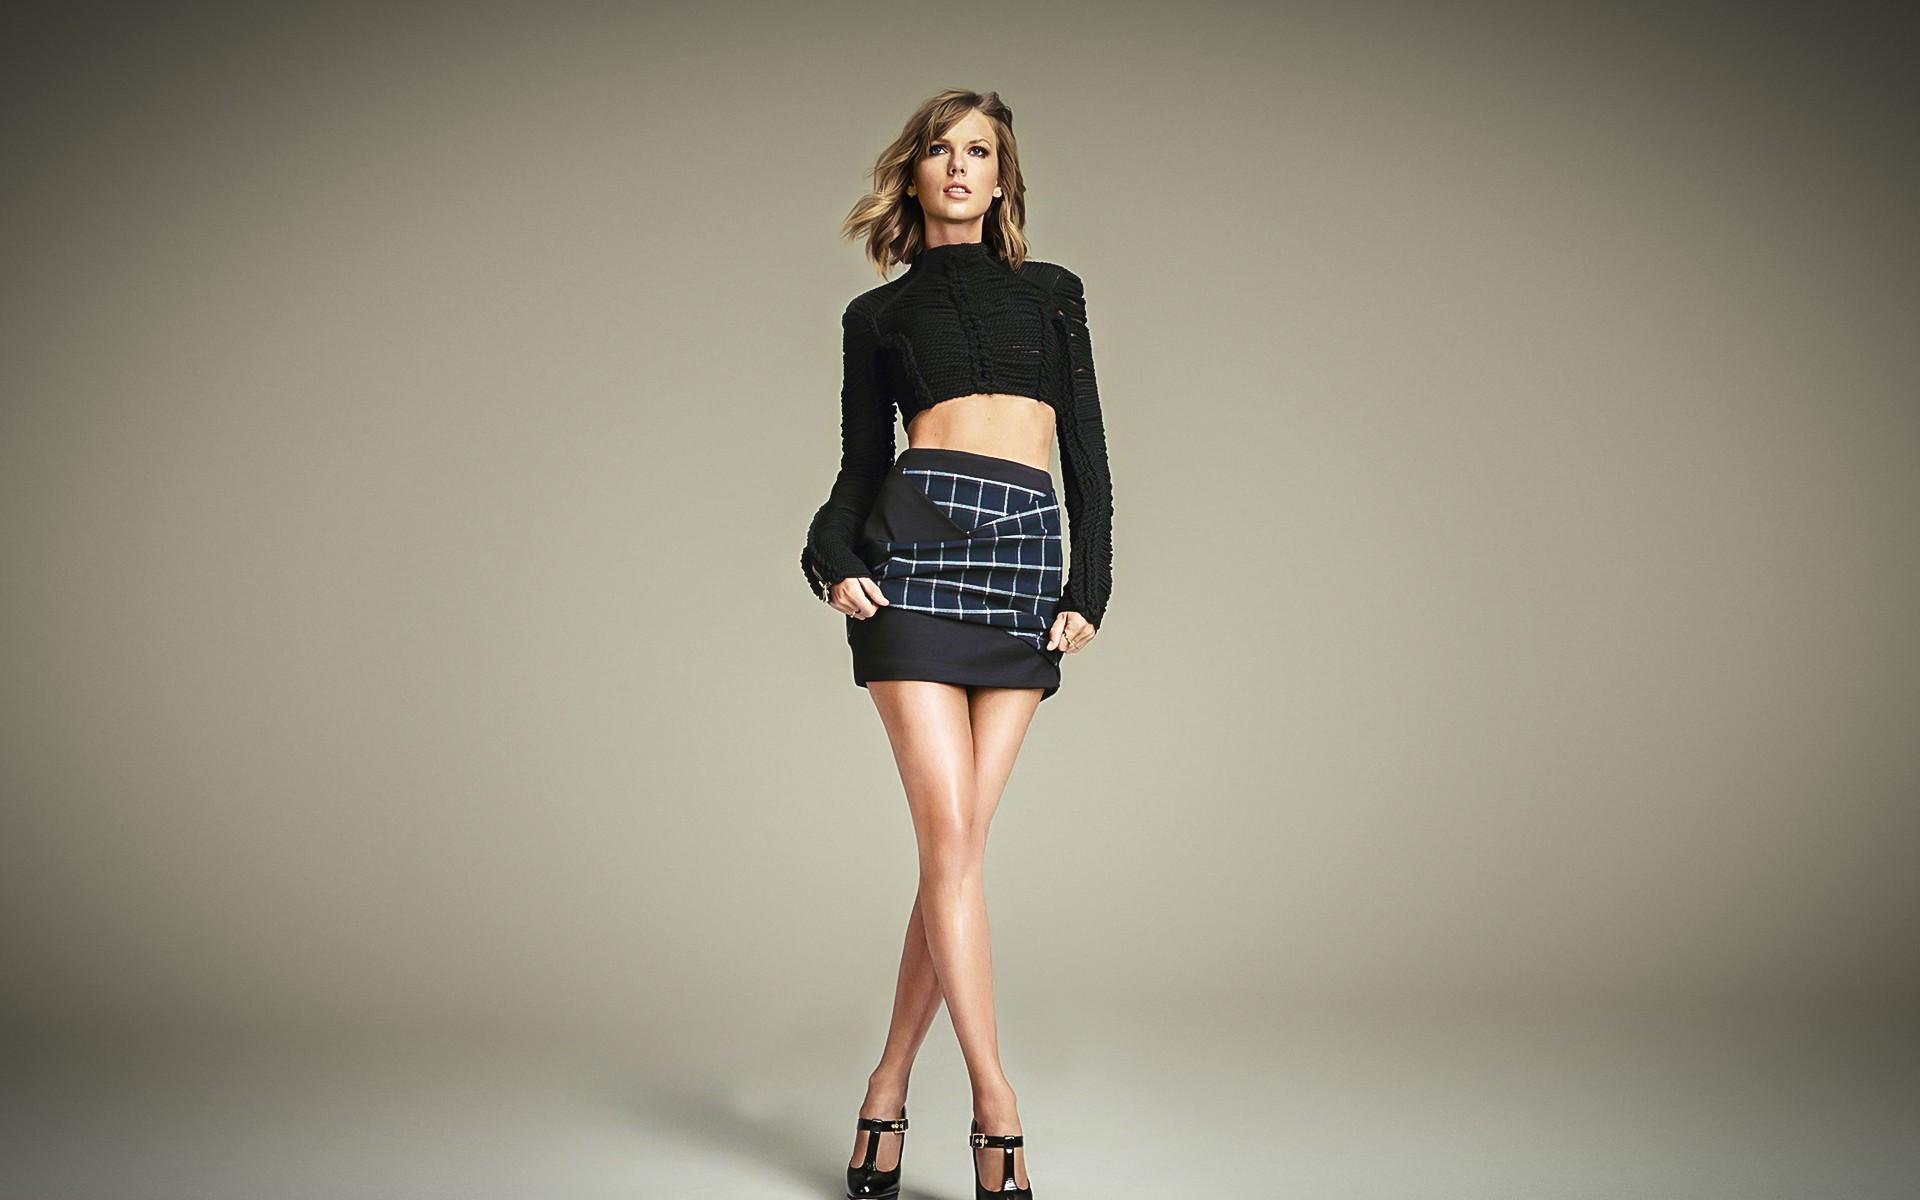 Hintergrundbilder : Frau, Modell-, Fotografie, Taylor Swift, Mode ...